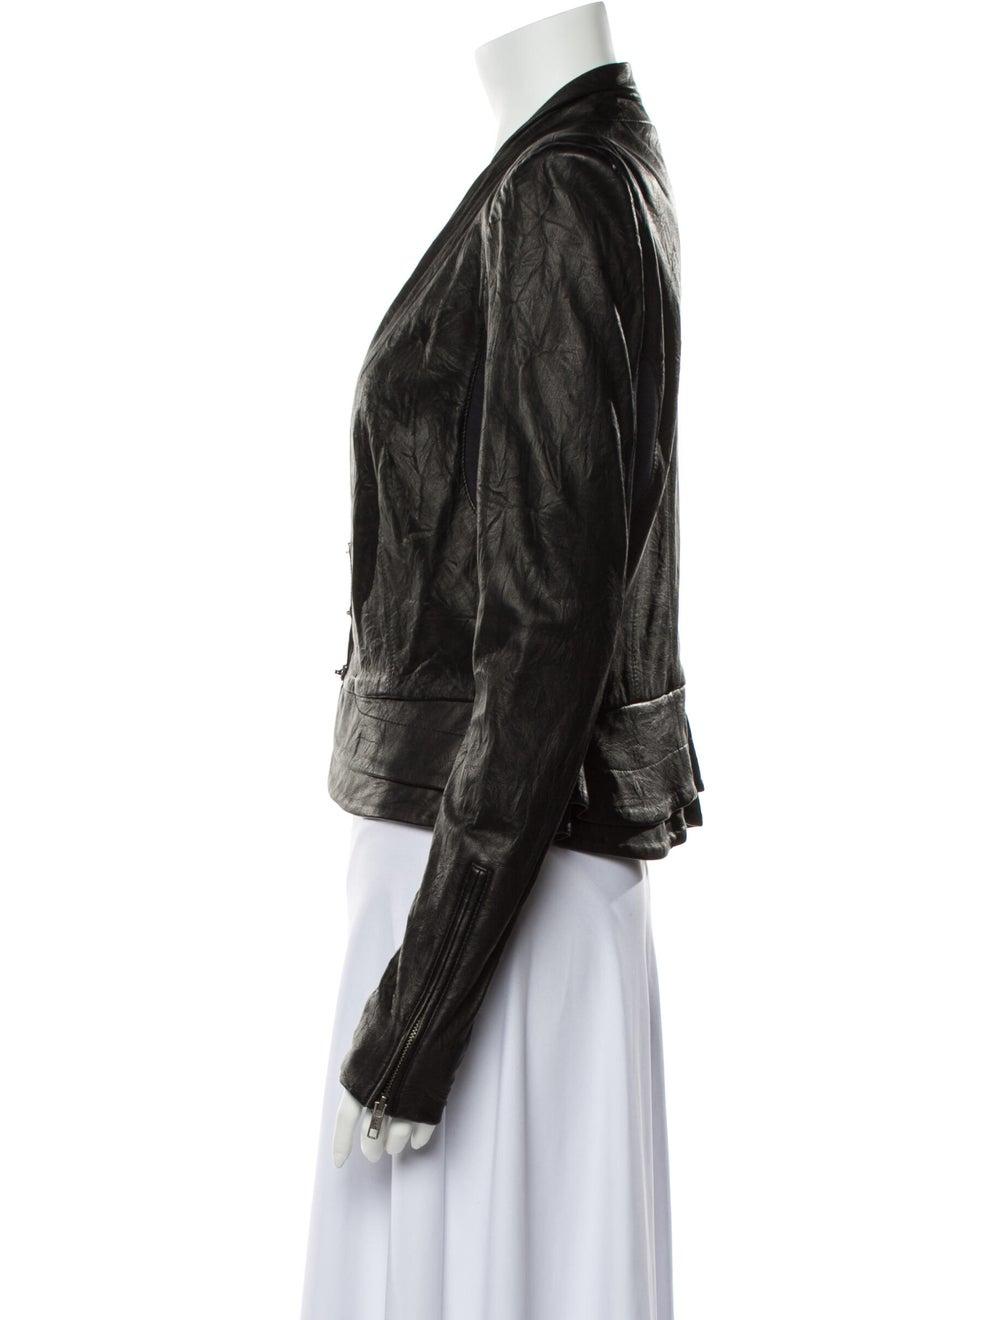 A.l.c. Leather Blazer Black - image 2